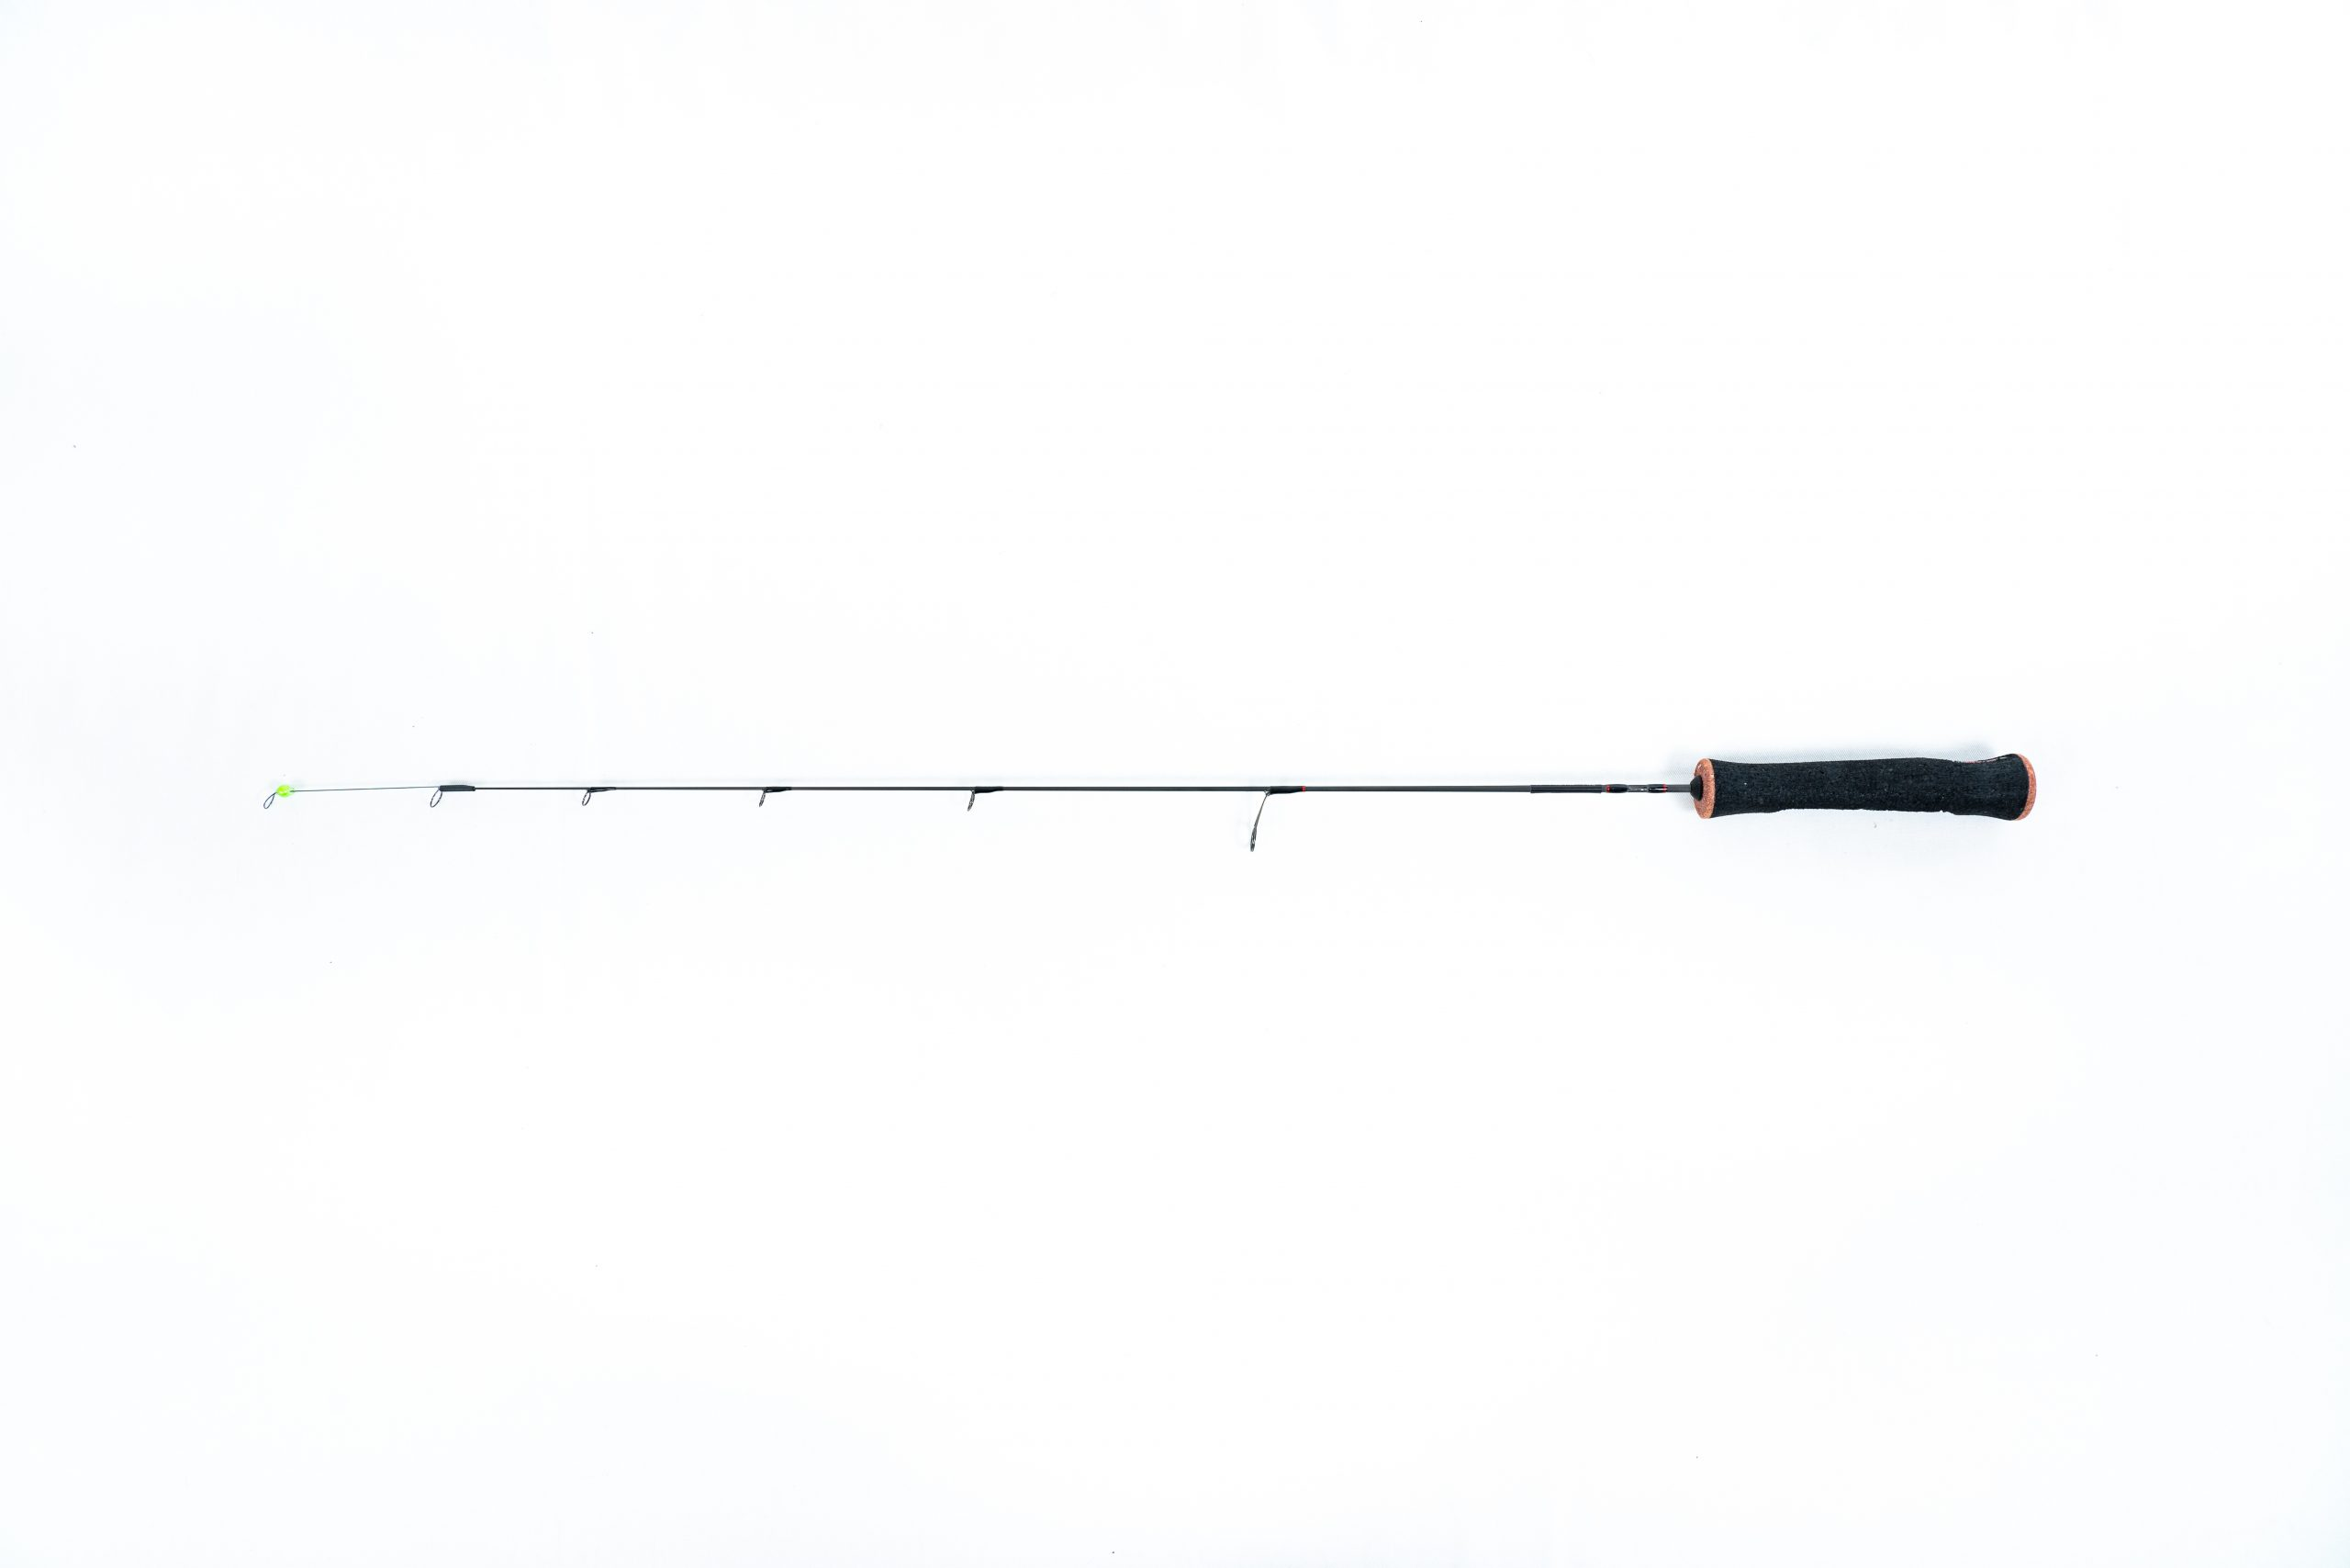 1-Litebite-Ice_Fishing_Rod